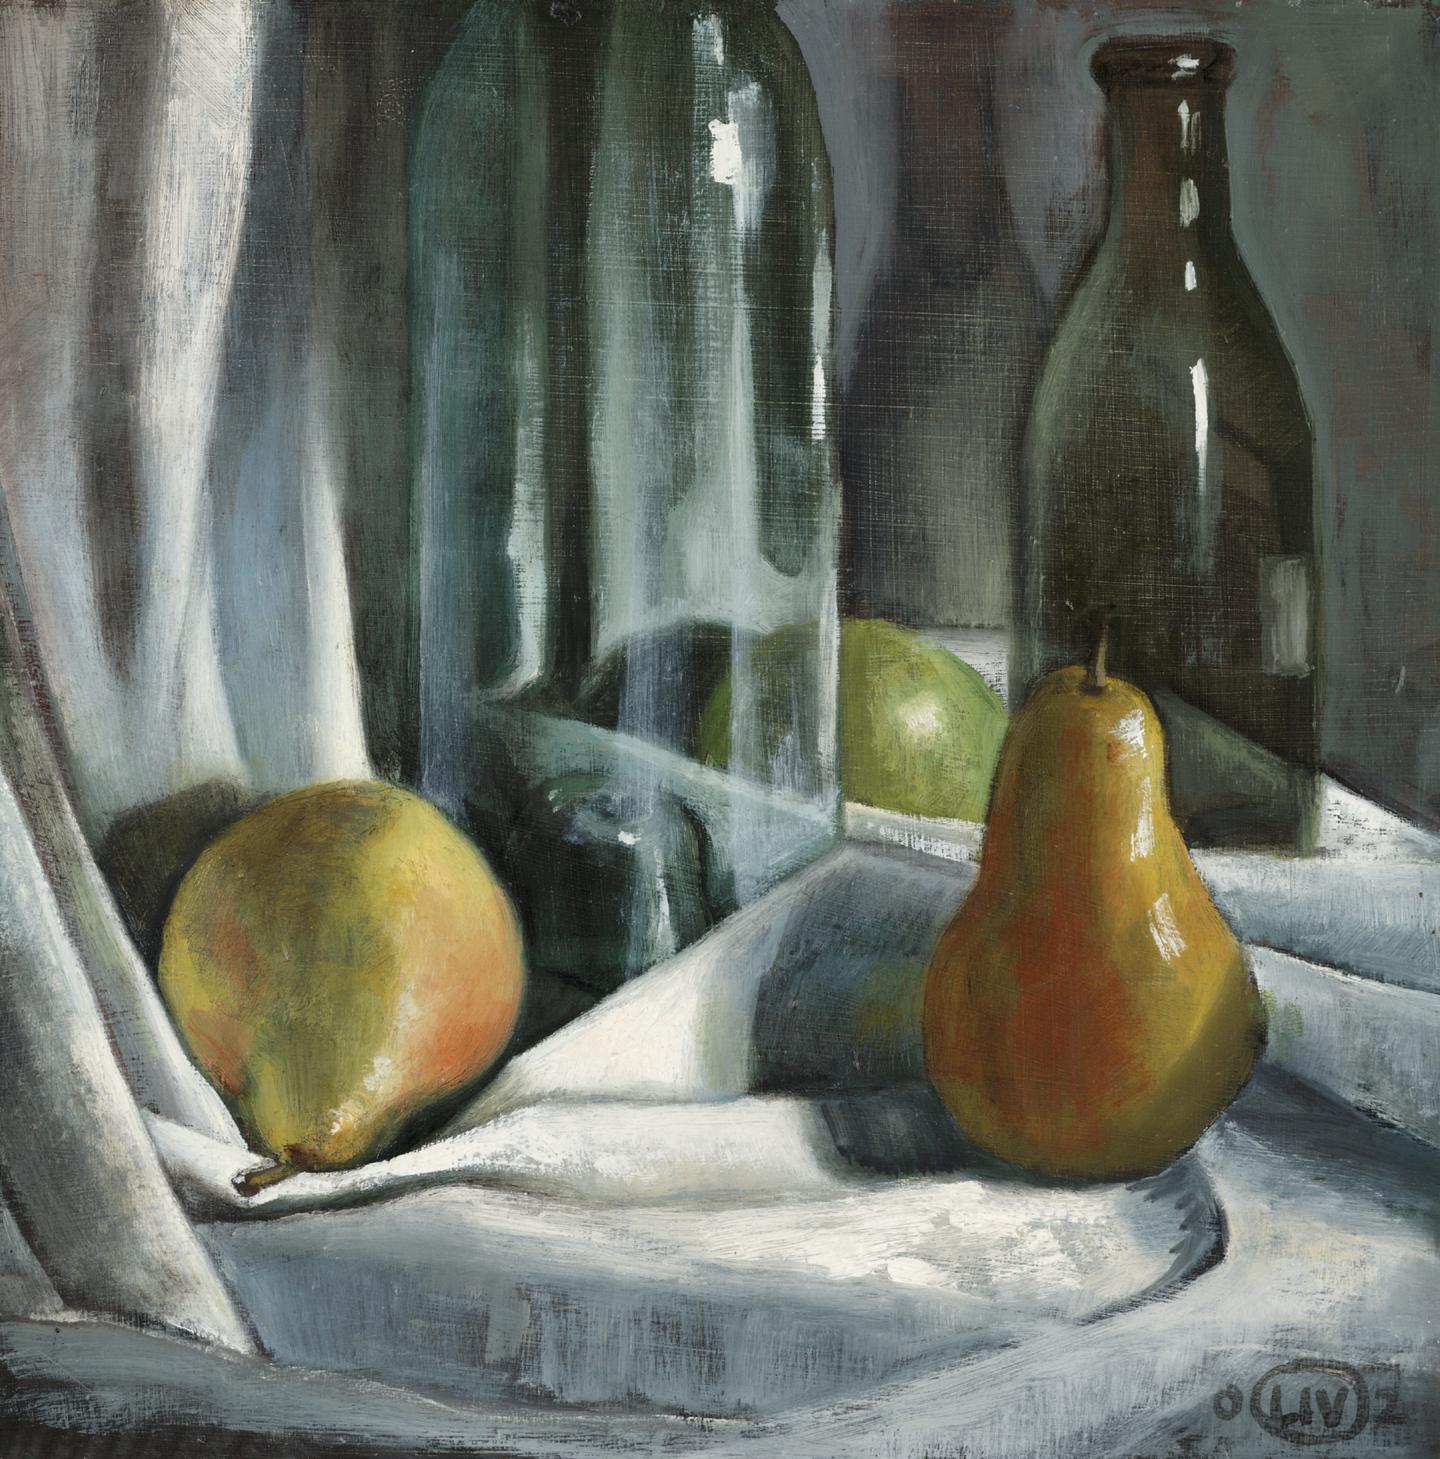 Glass and Pears 1.jpg